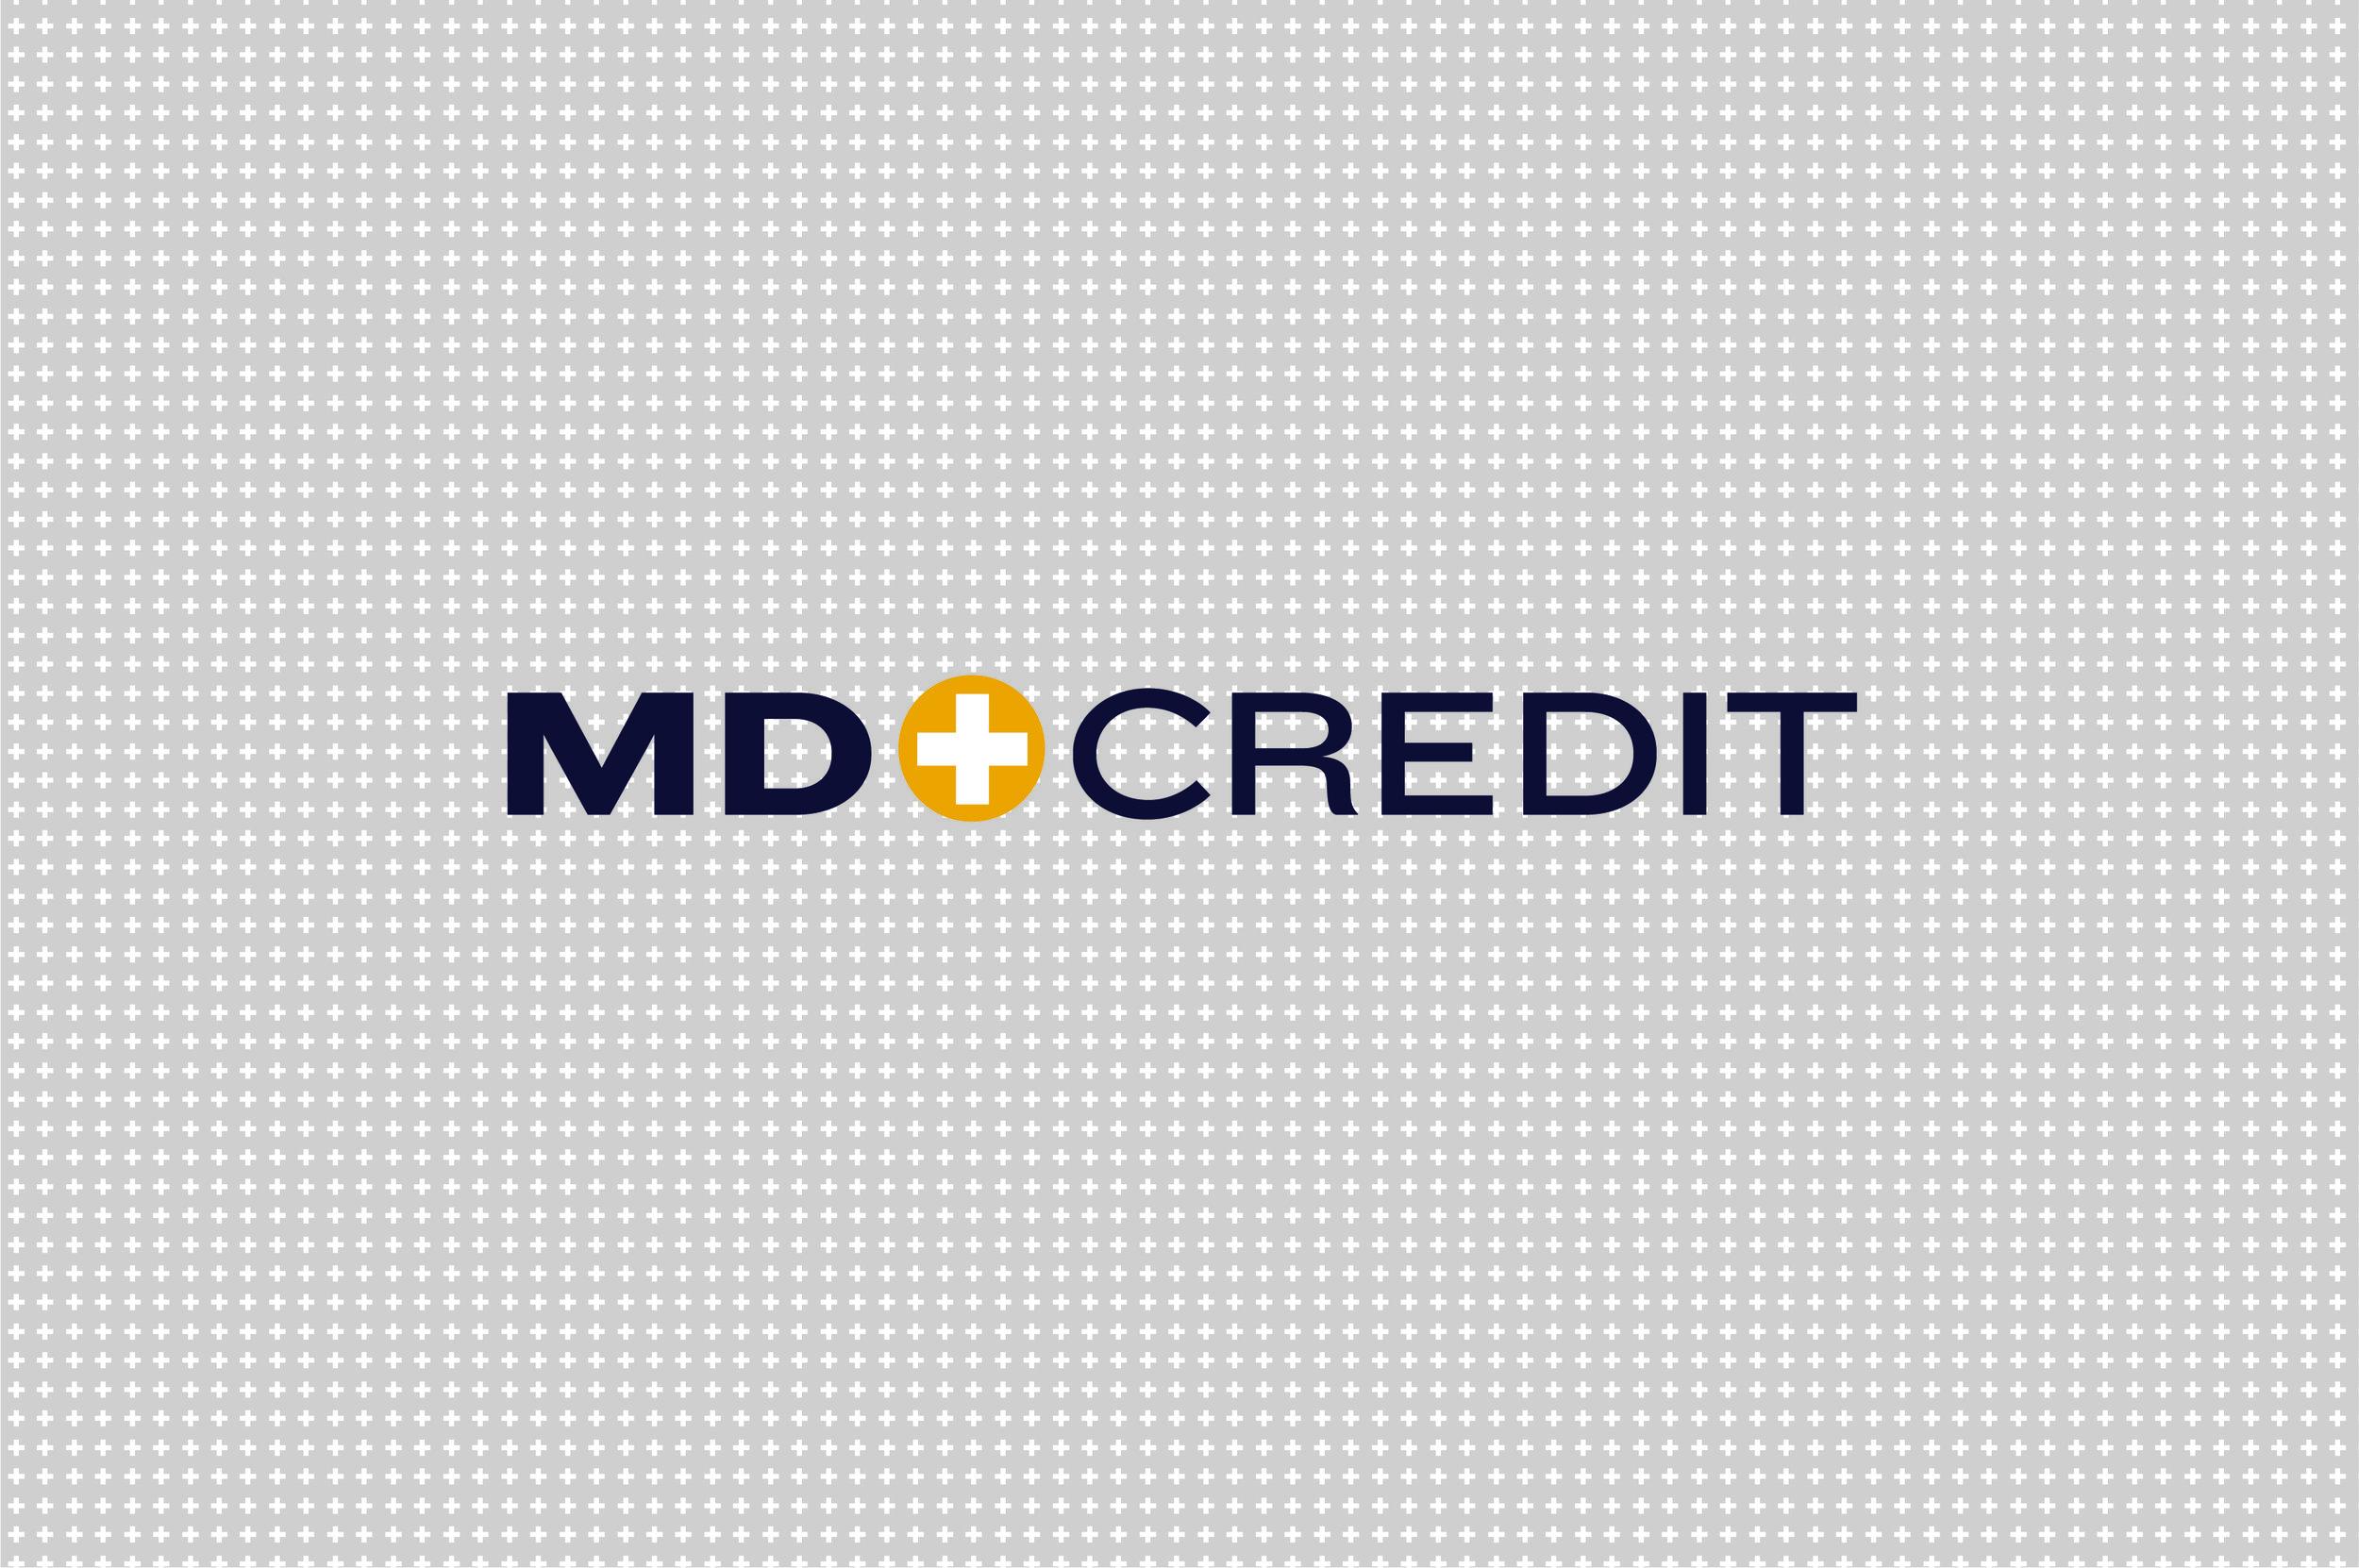 MDcredit_logo_bkrnd.jpg